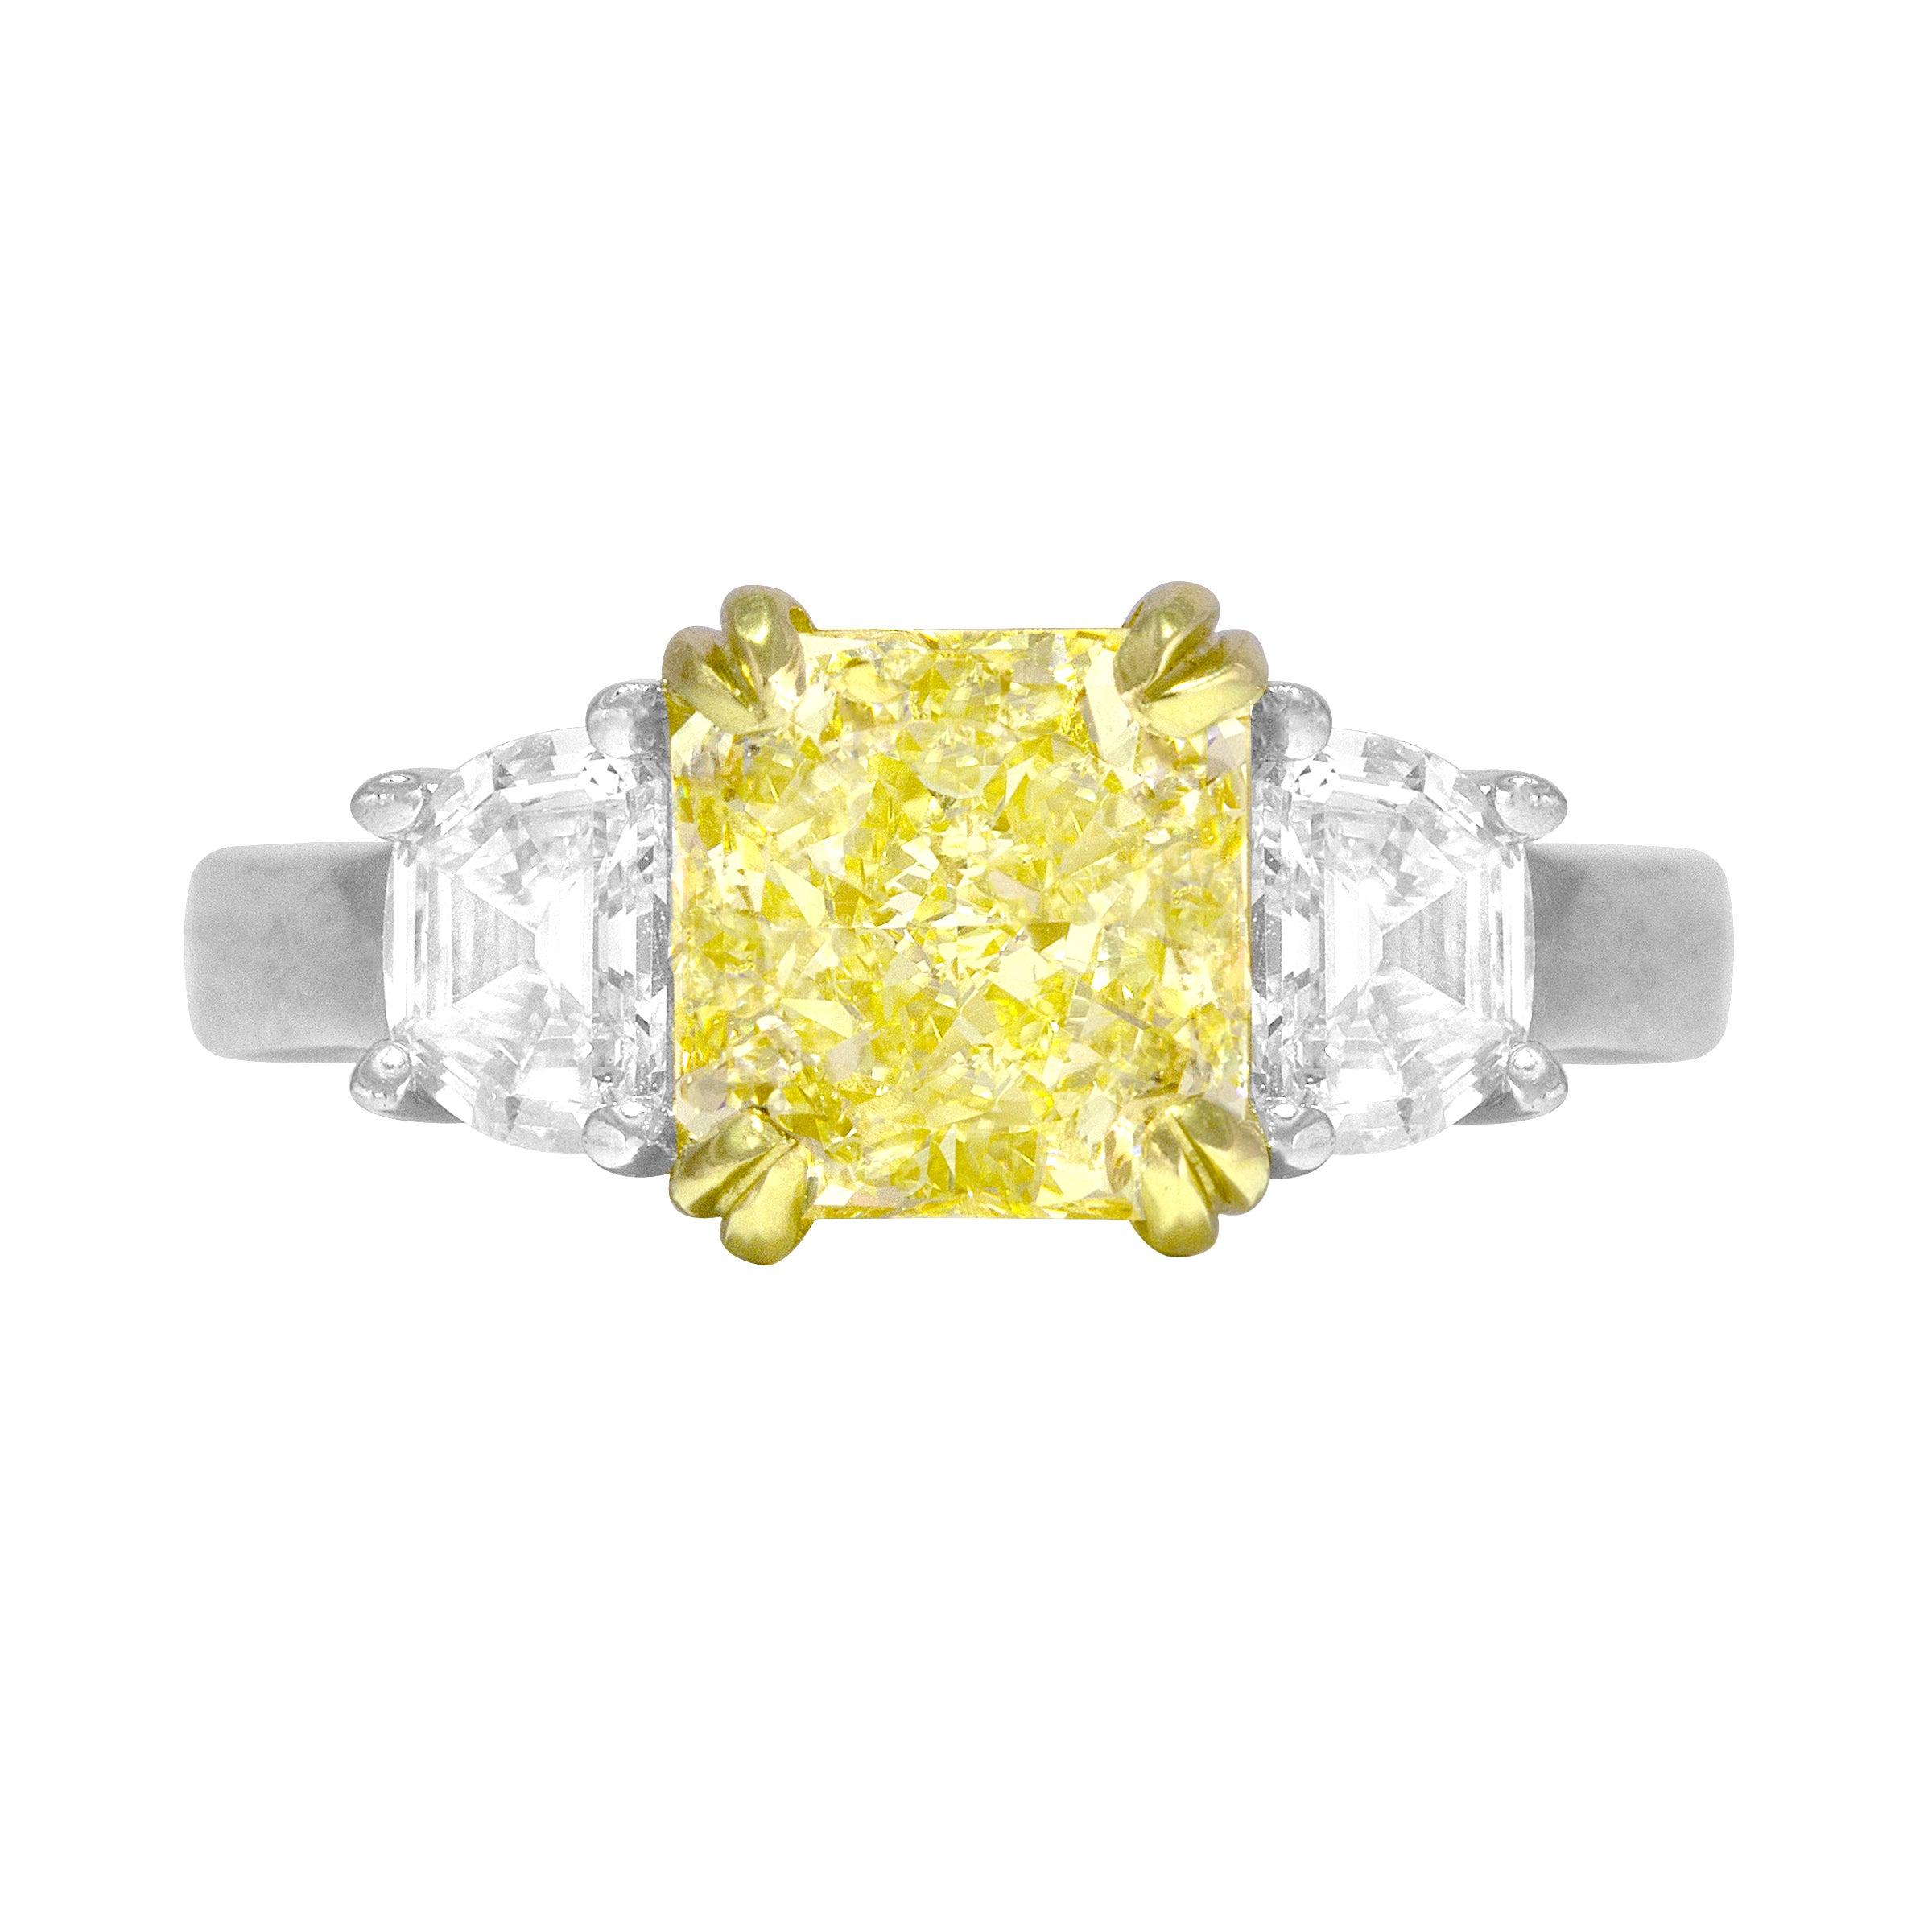 DiamondTown GIA Certified 2.25 Carat Natural Fancy Yellow Diamond Ring